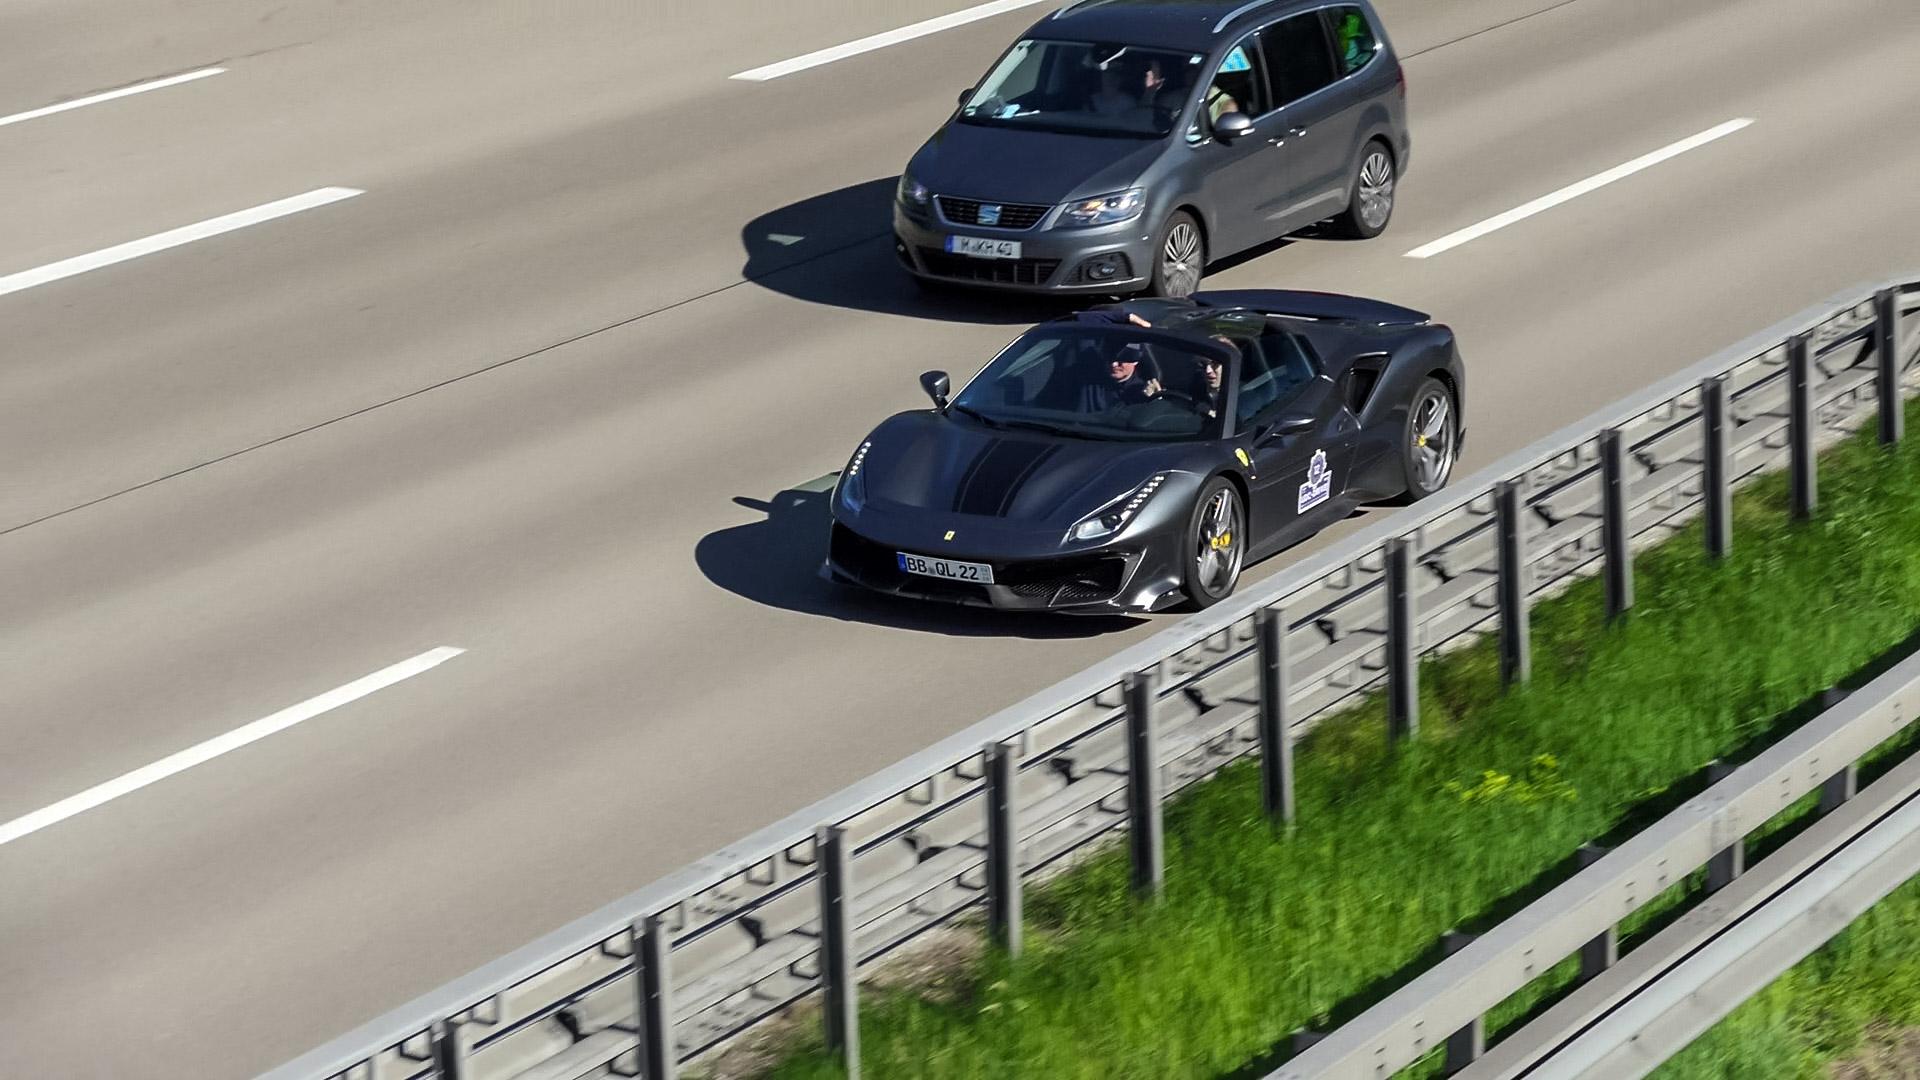 Ferrari 488 Pista Spider - BB-QL-22